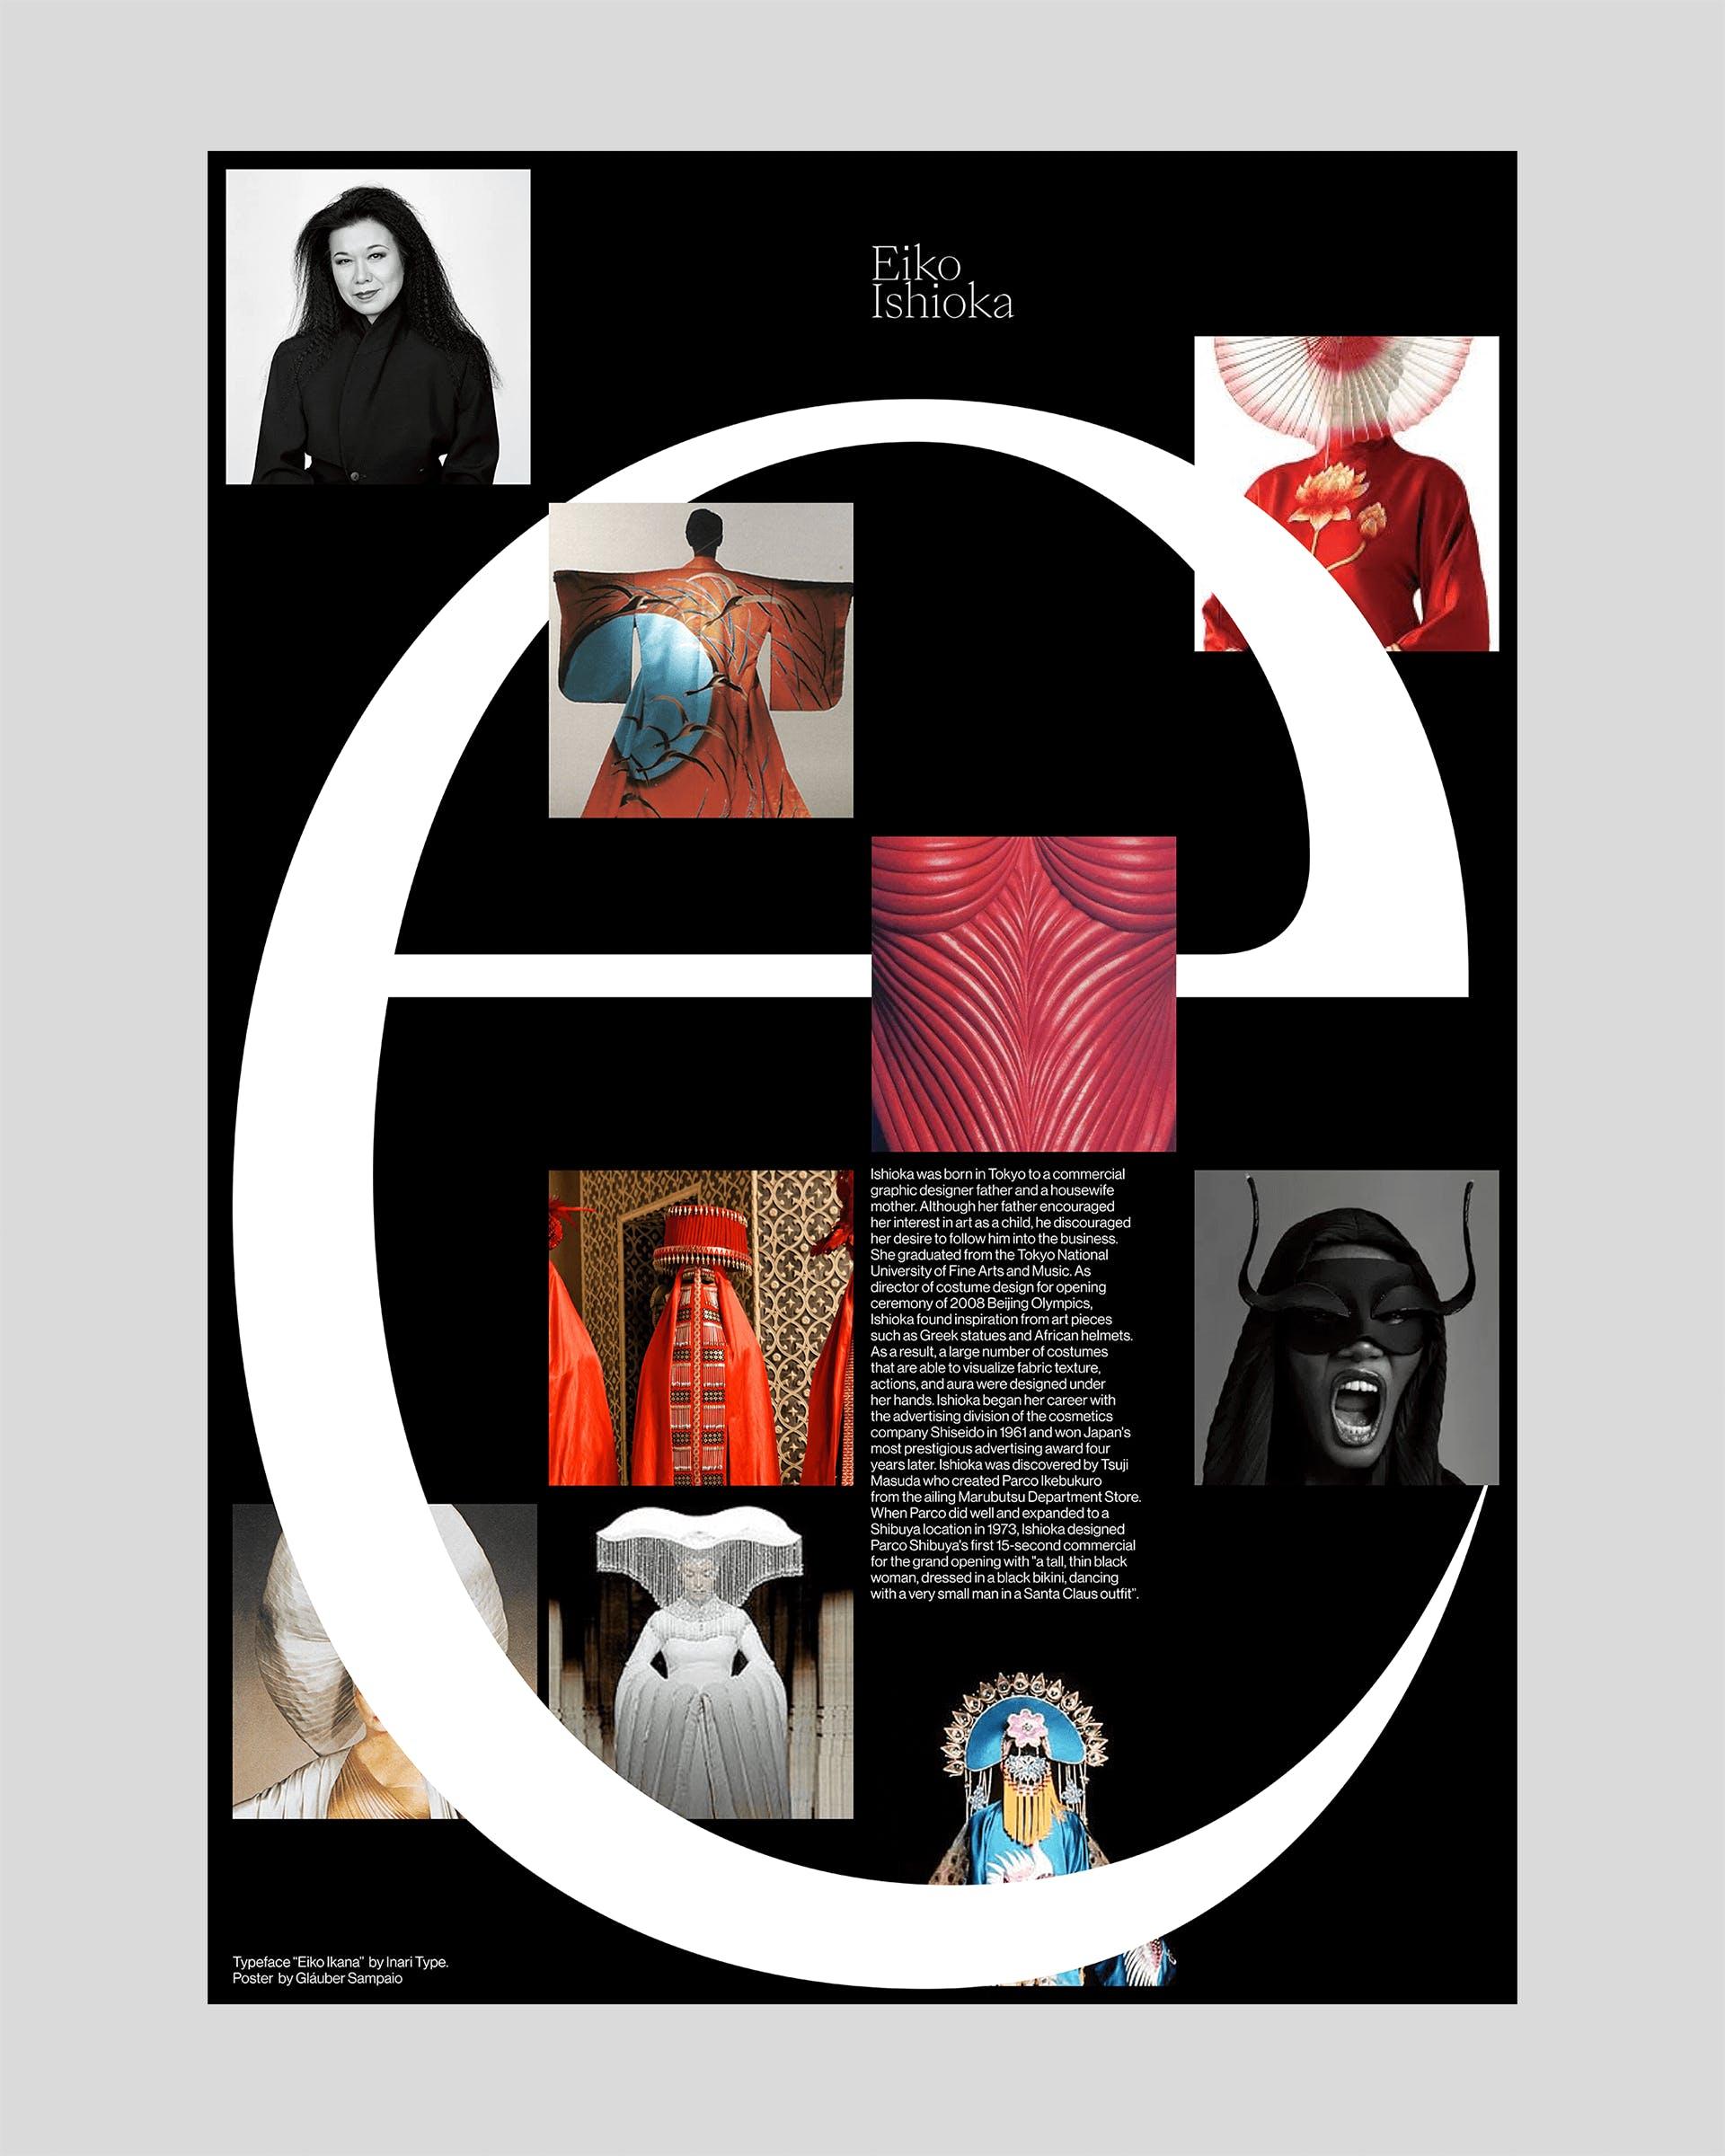 EIKO-Poster-01.png